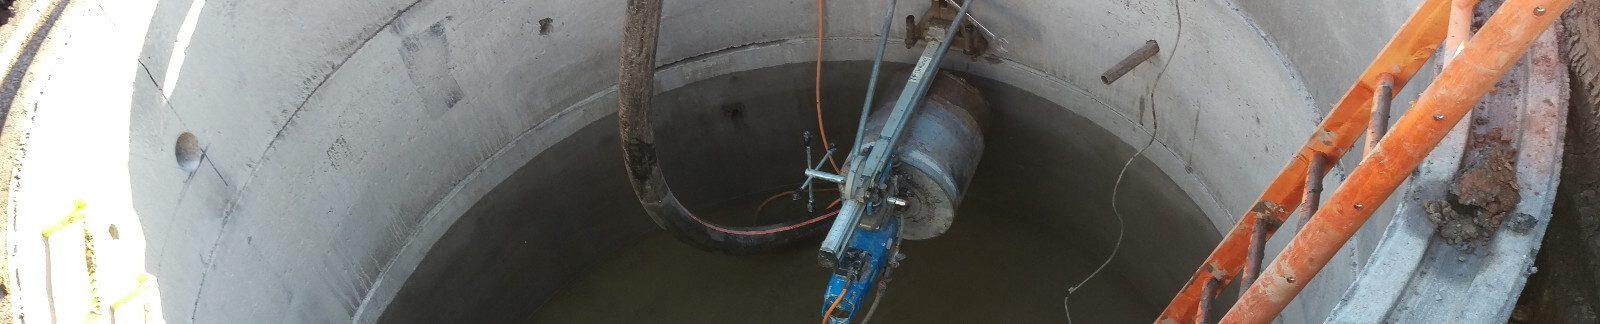 TF Drilling   Diamond Drilling & Sawing